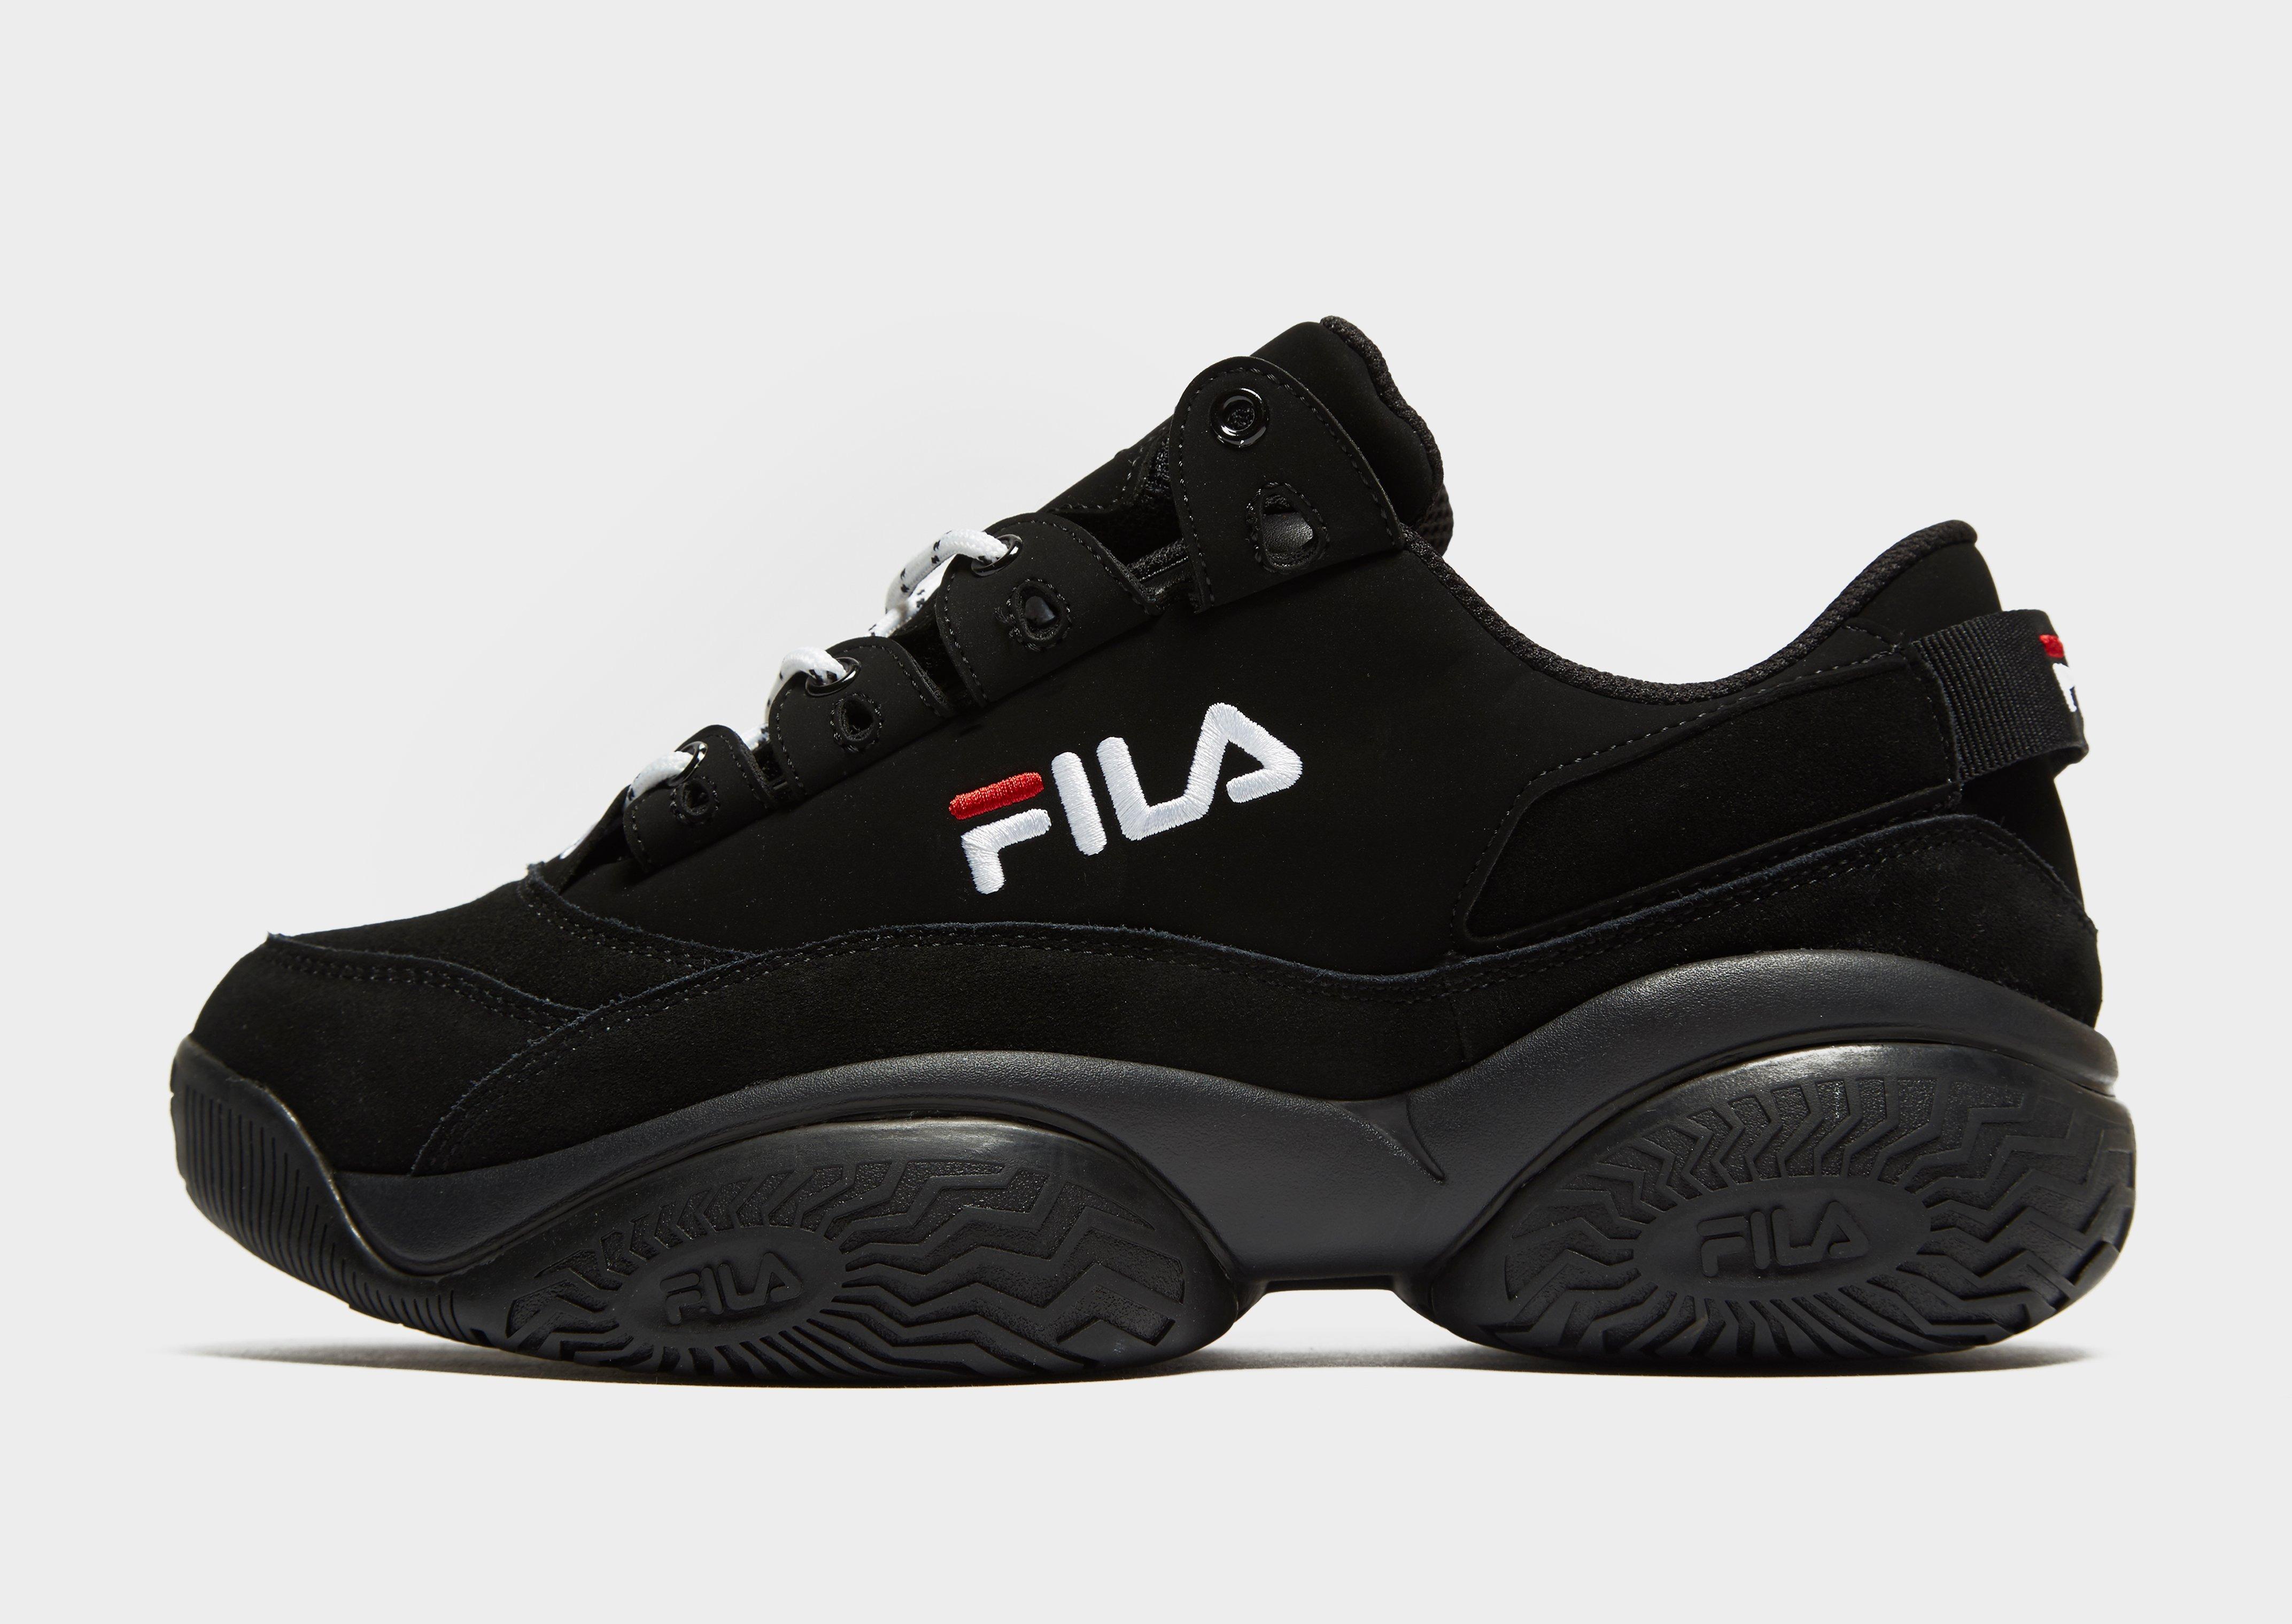 FILA Baskets Provenance noires